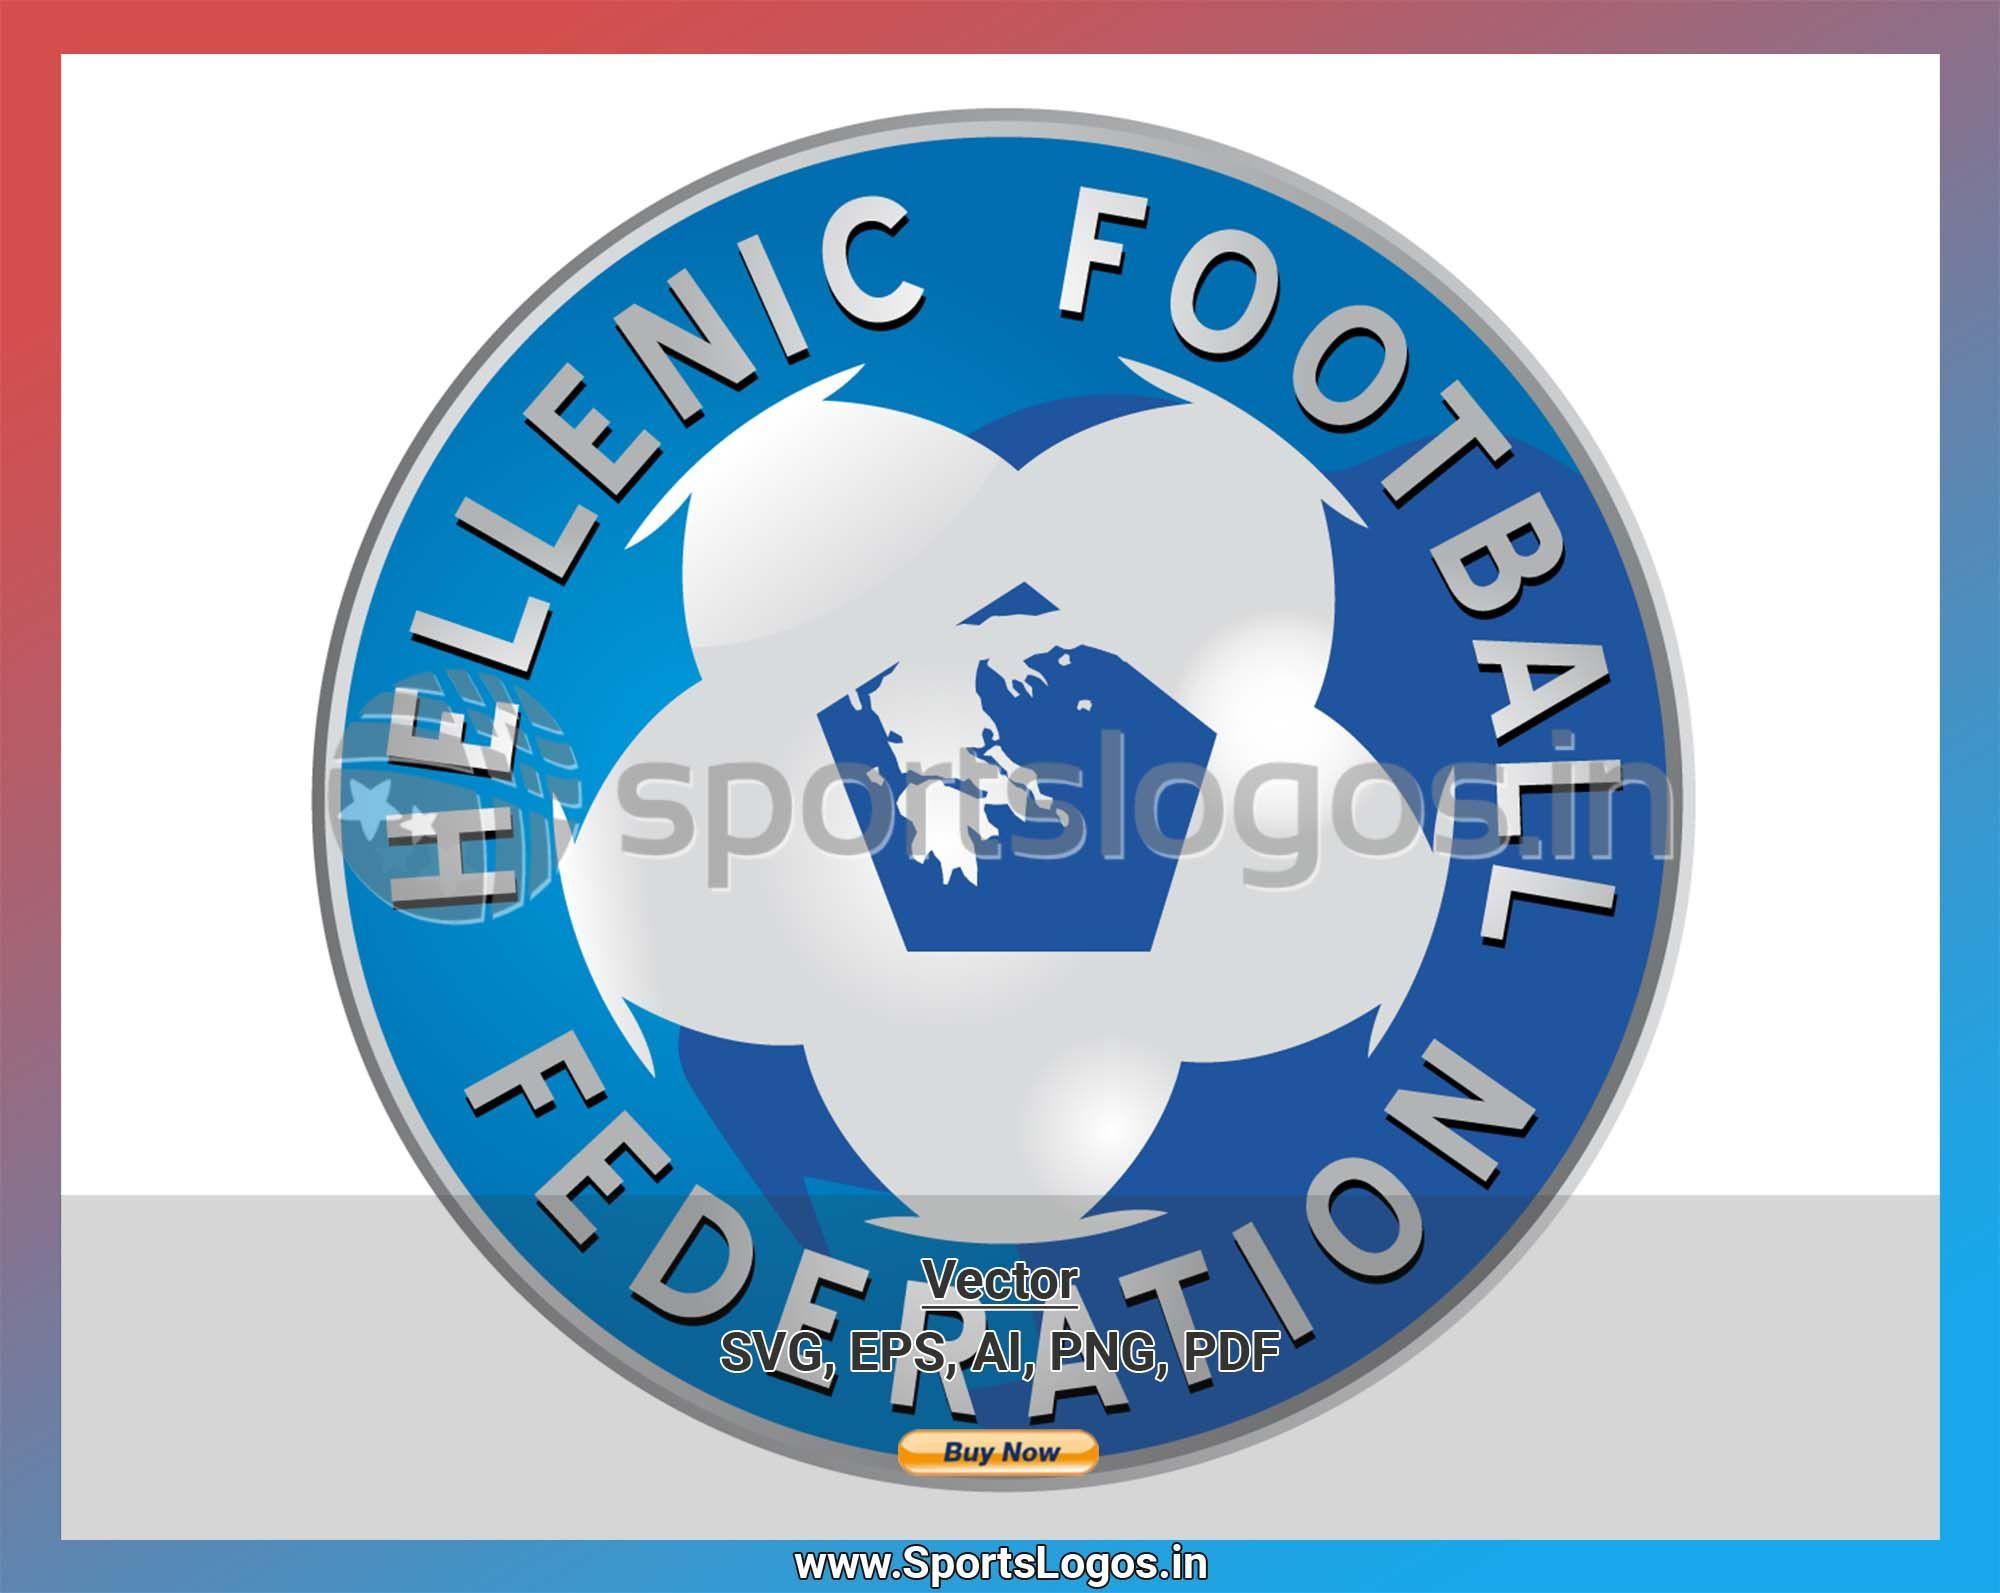 Greece Soccer Sports Vector Svg Logo In 5 Formats Spln001663 Sports Logos Embroidery Vector For Nfl Nba Nhl Mlb Milb And More Association Logo Sports Logo Sport Soccer